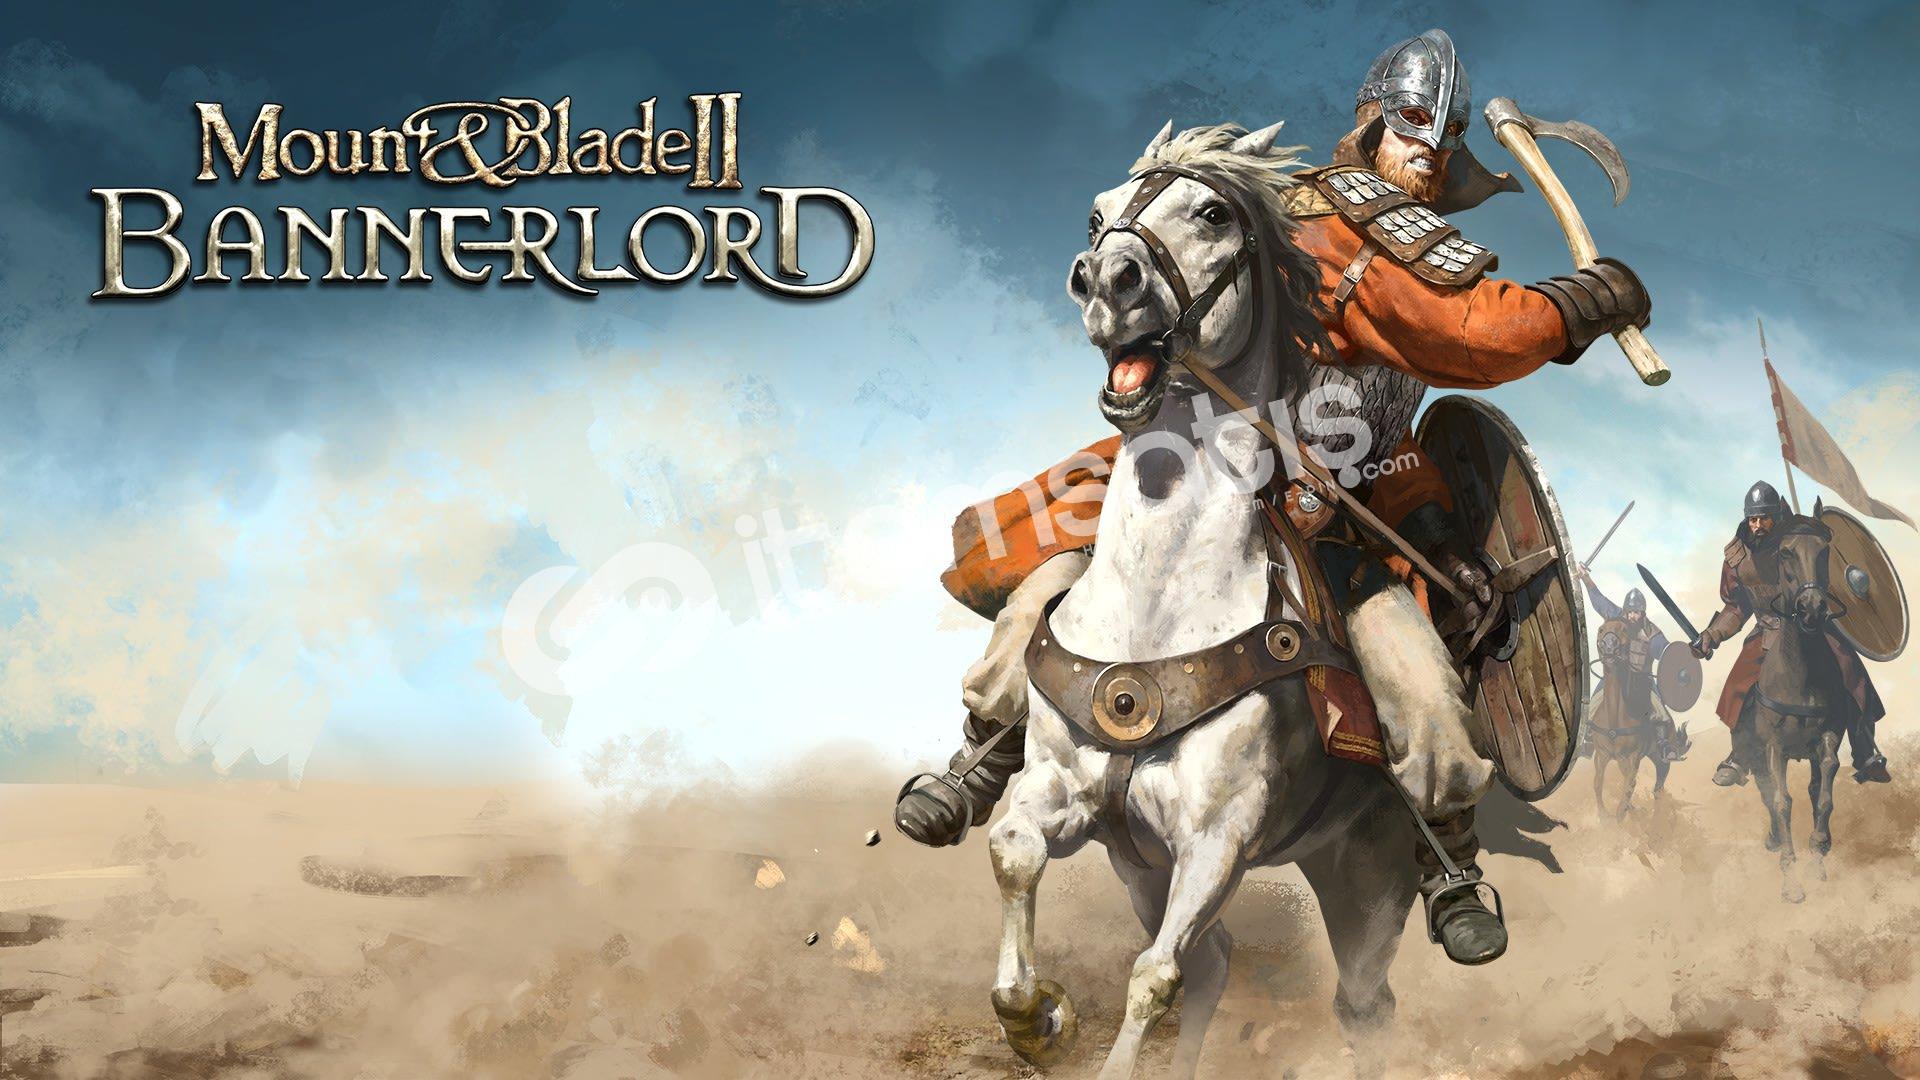 Mount & Blade II: Bannerlord + Garanti + Anında Teslim